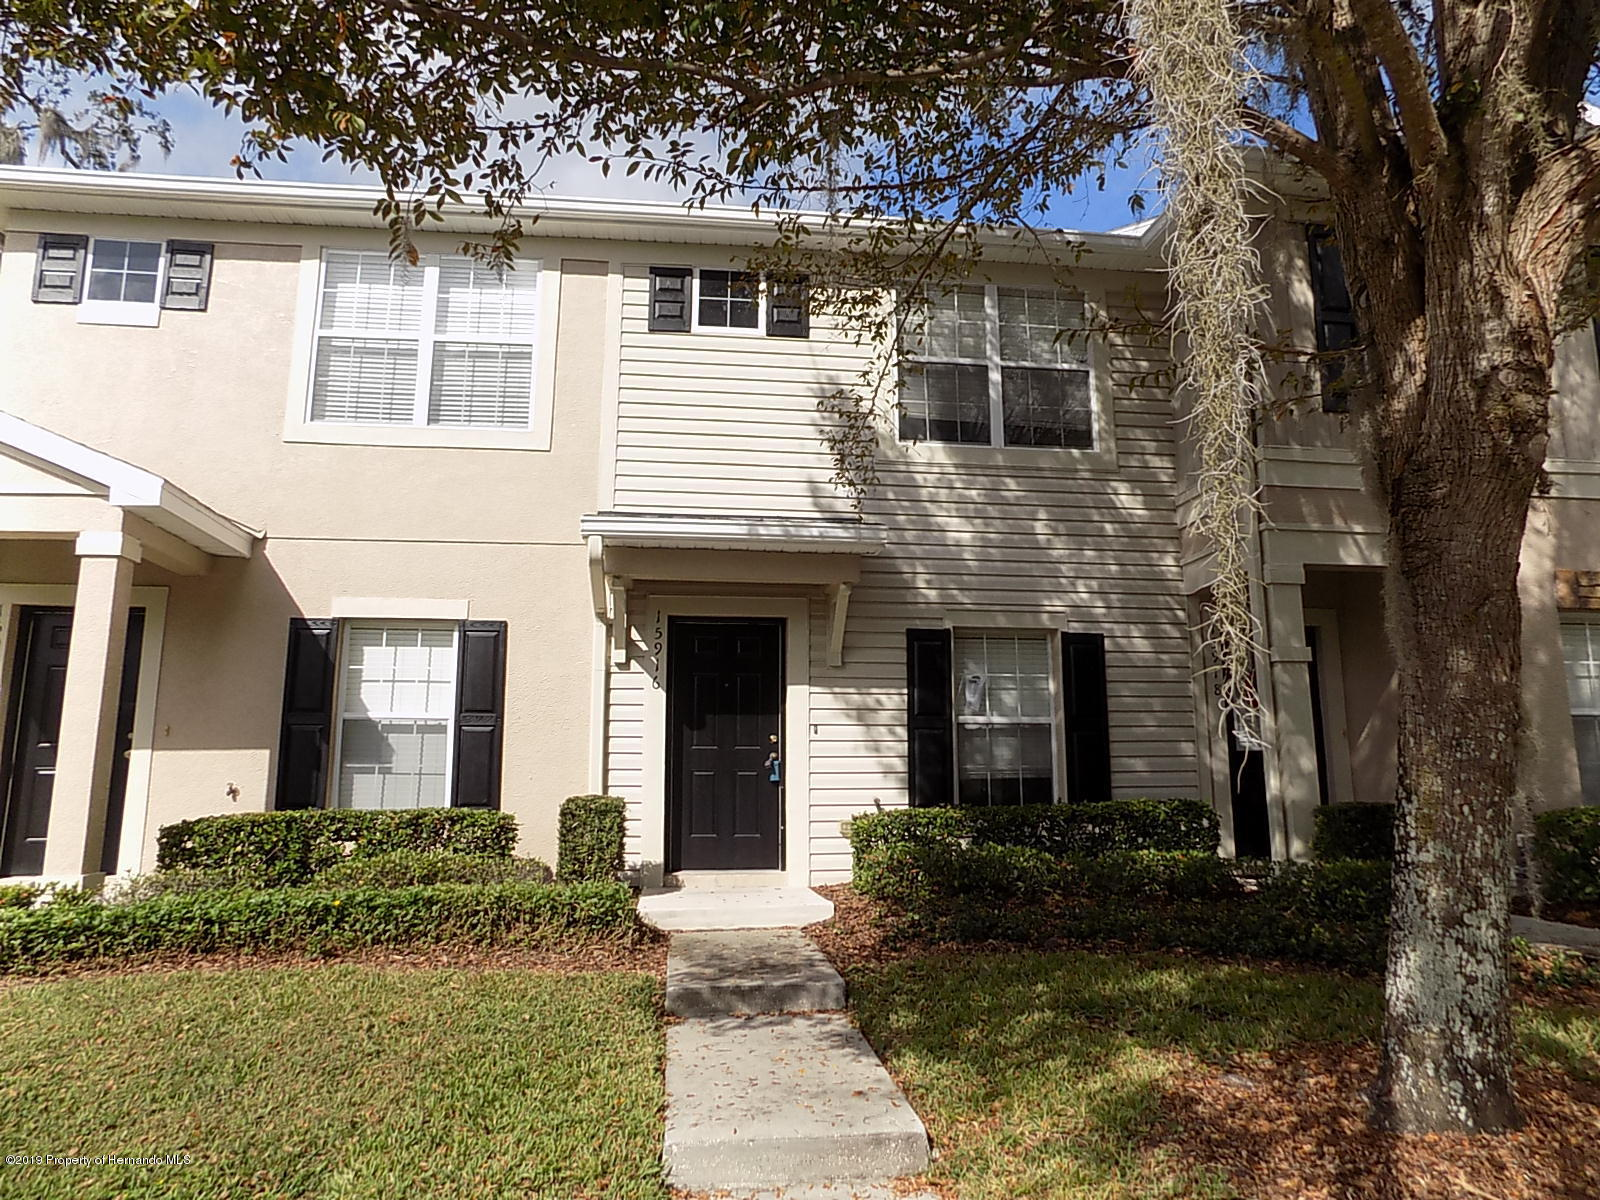 15916 FISHHAWK VIEW Drive, Lithia, Florida 33547, 2 Bedrooms Bedrooms, ,2 BathroomsBathrooms,Residential,For Sale,FISHHAWK VIEW,2206087